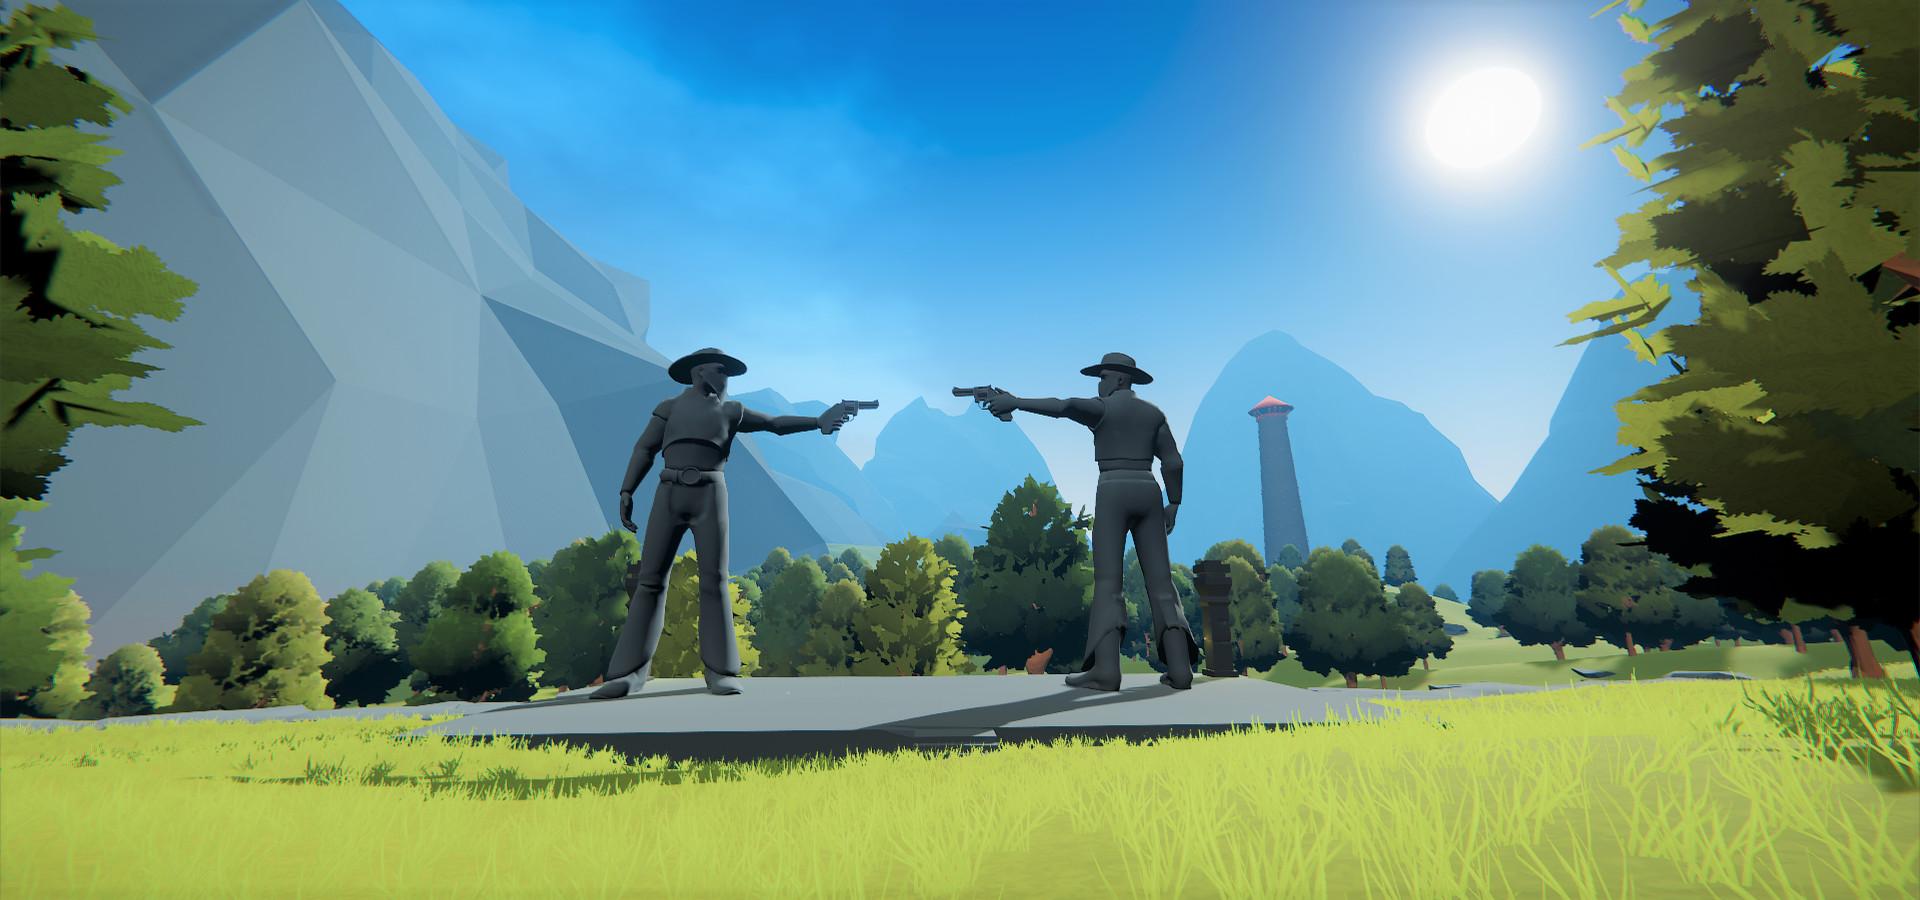 Link Tải Game Wild West and Wizards Miễn Phí Thành Công